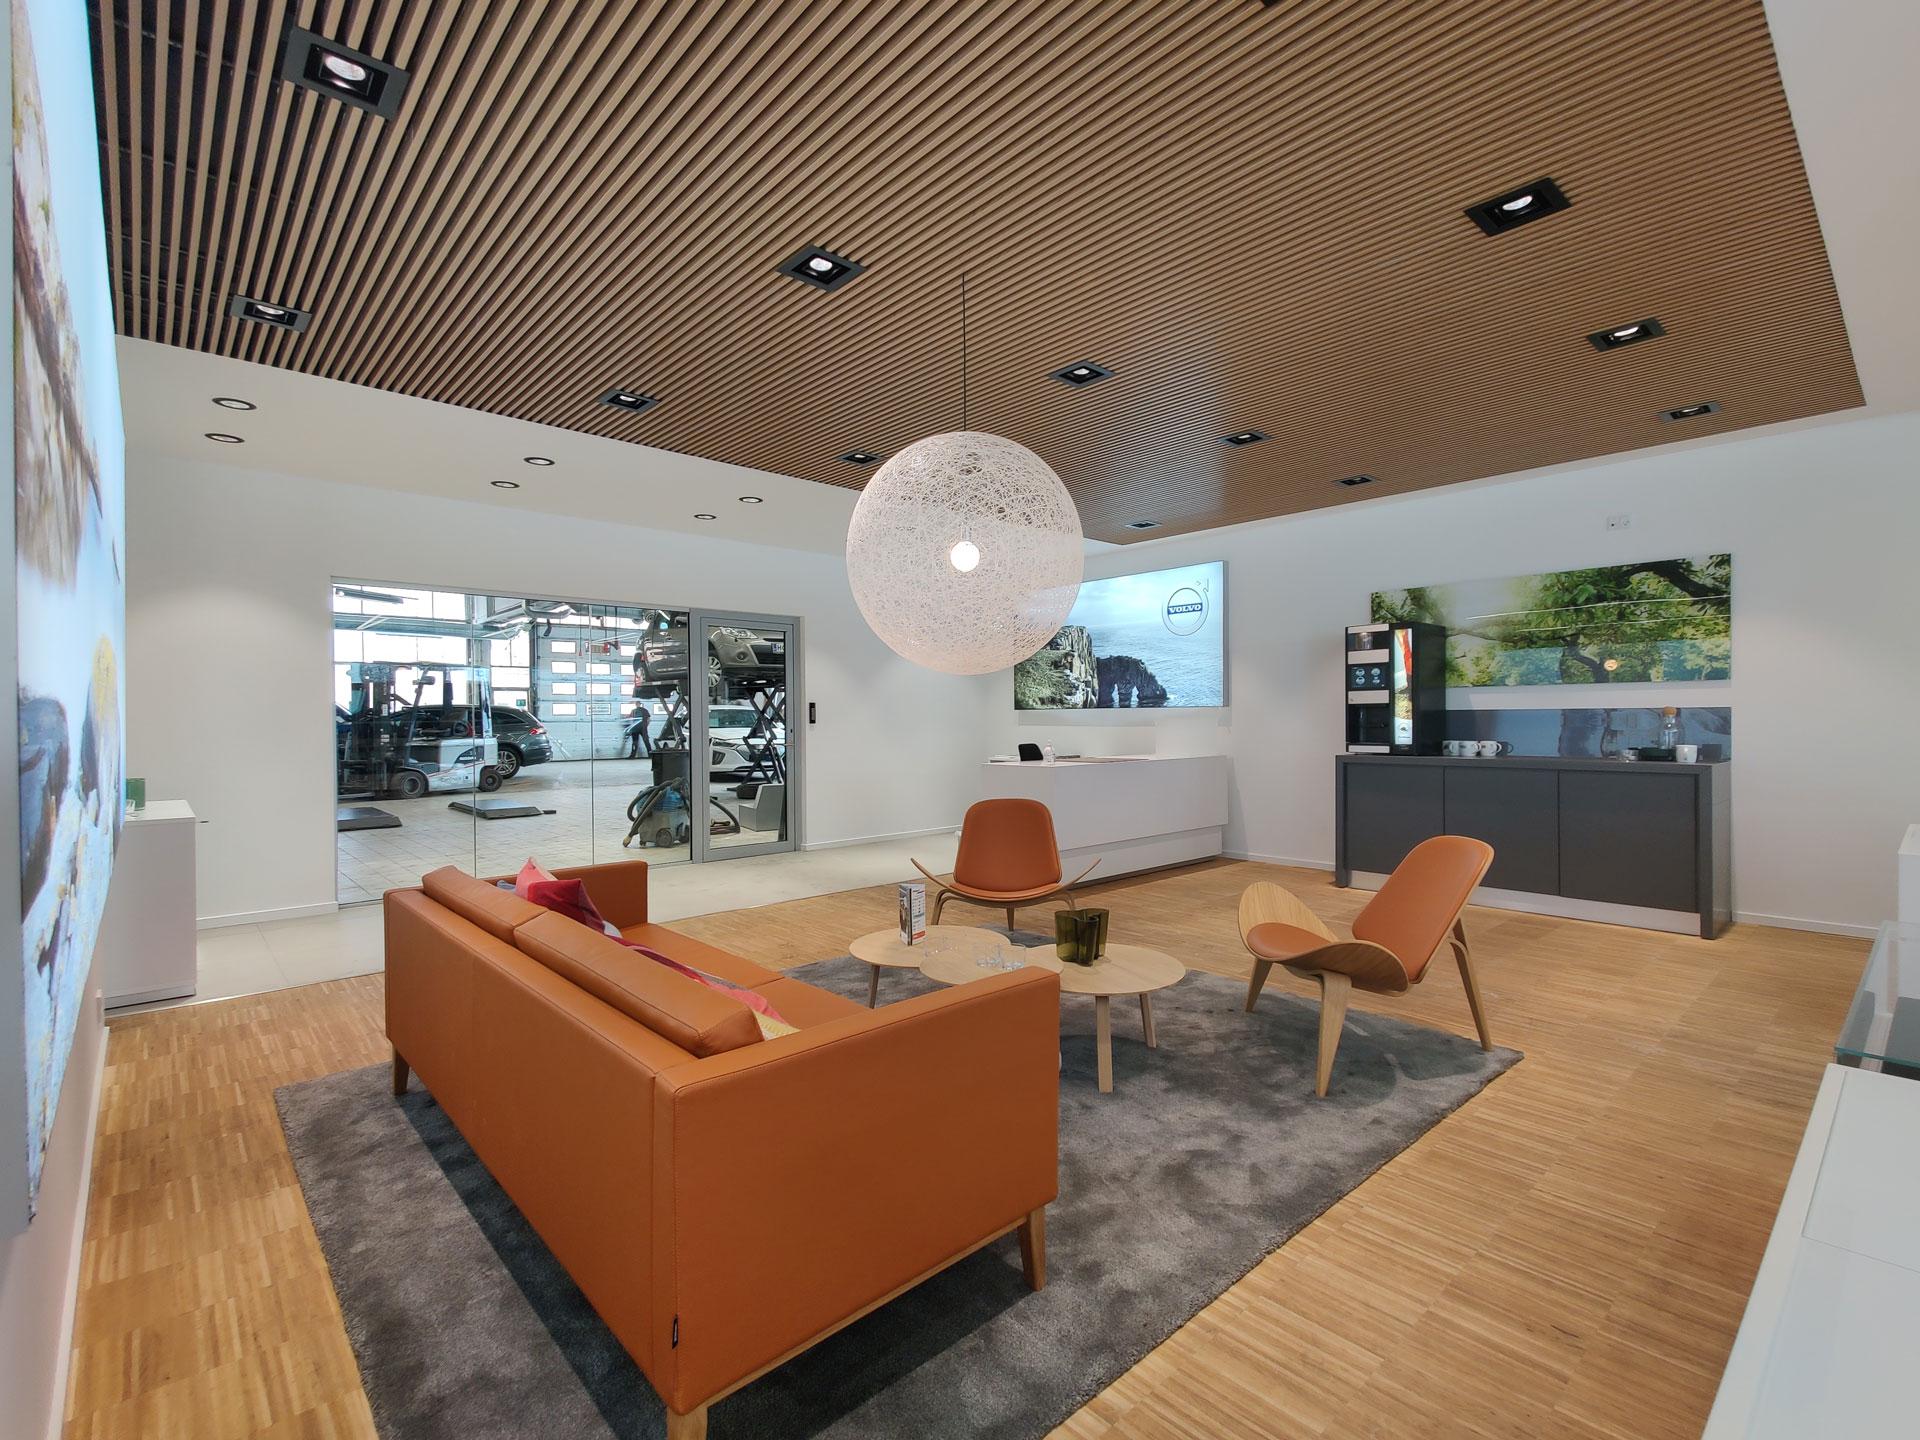 Volvo lounge hos Andersen Biler Gladsaxe 2